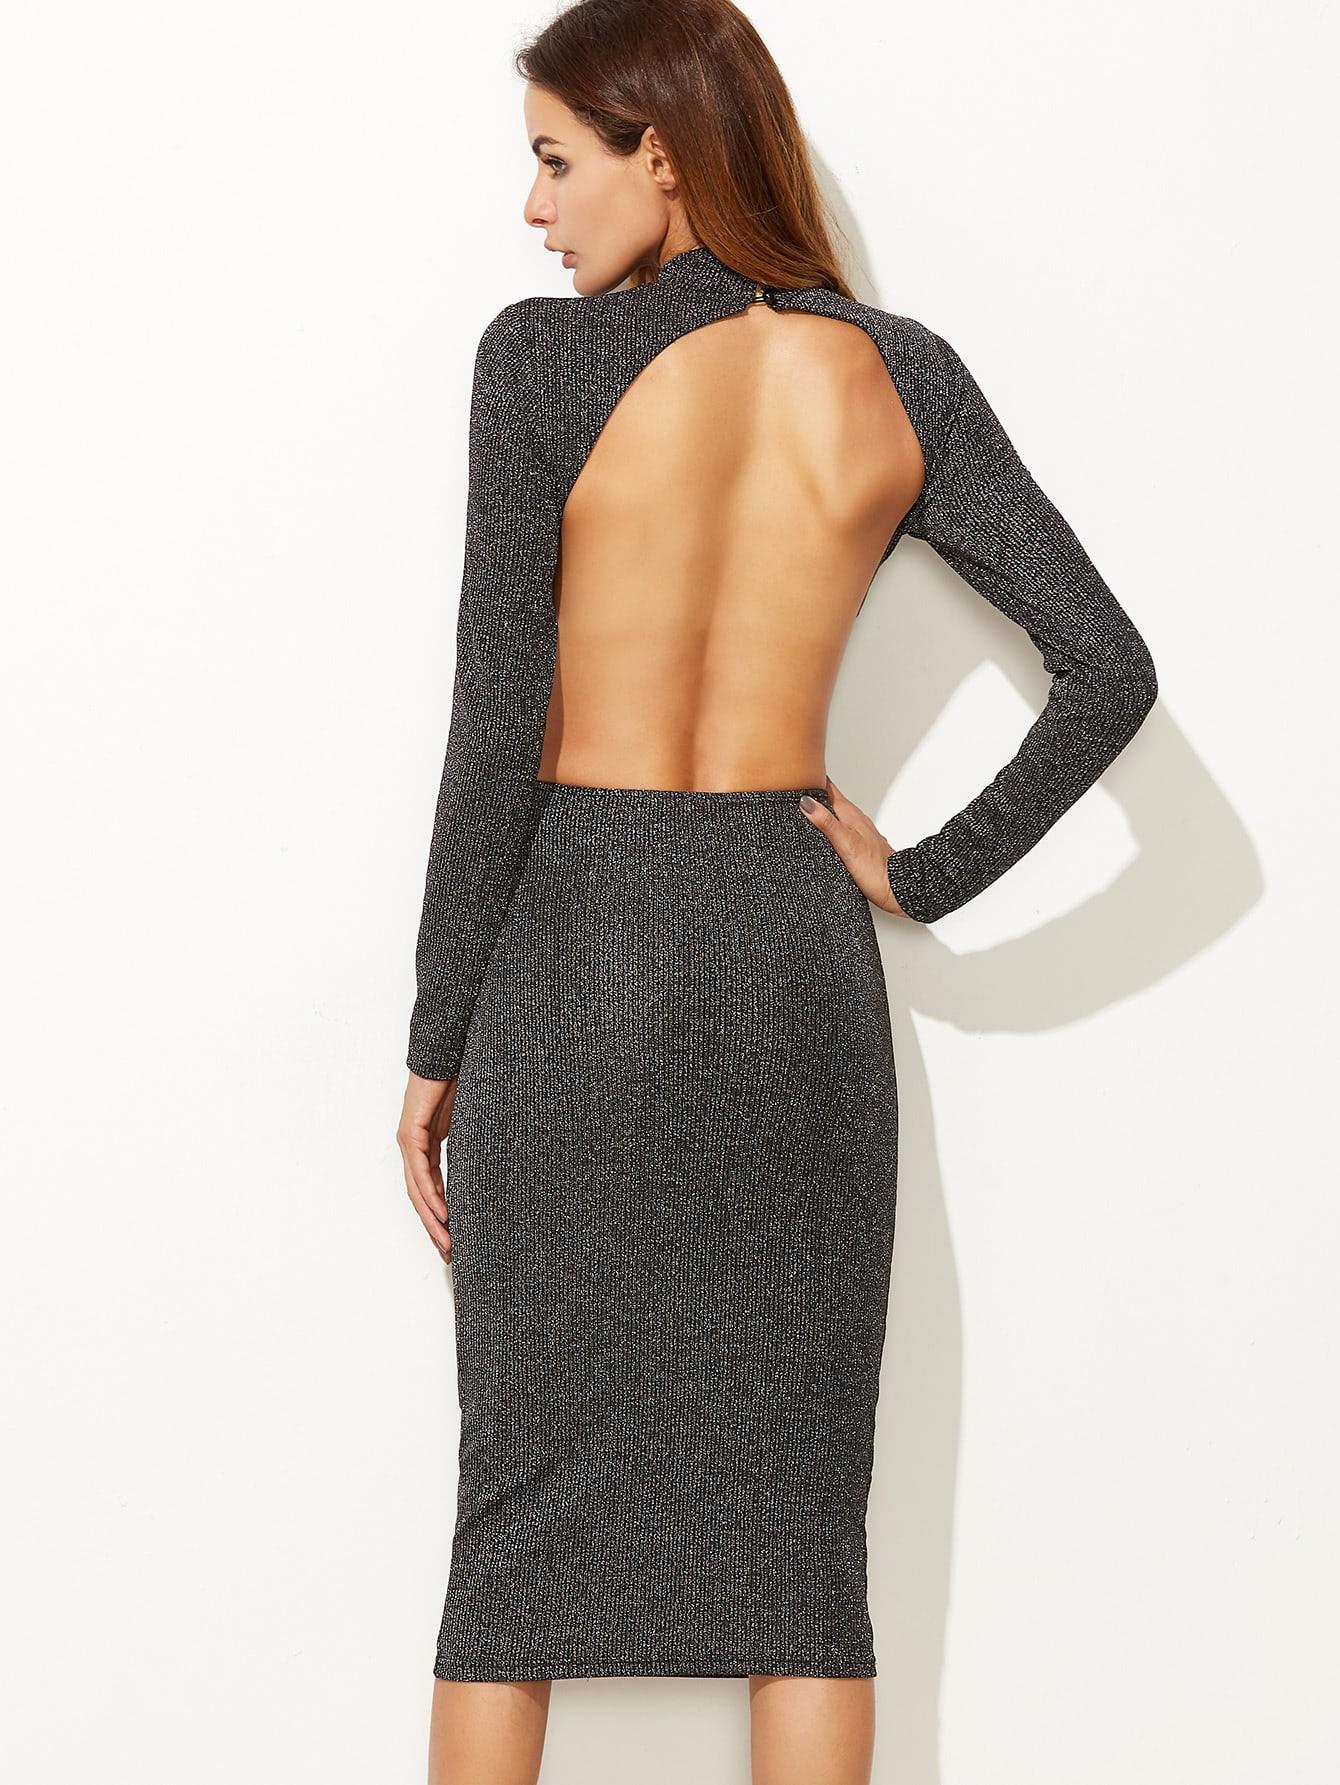 Grey Ribbed Knit Open Back Sparkle Dress open back fit